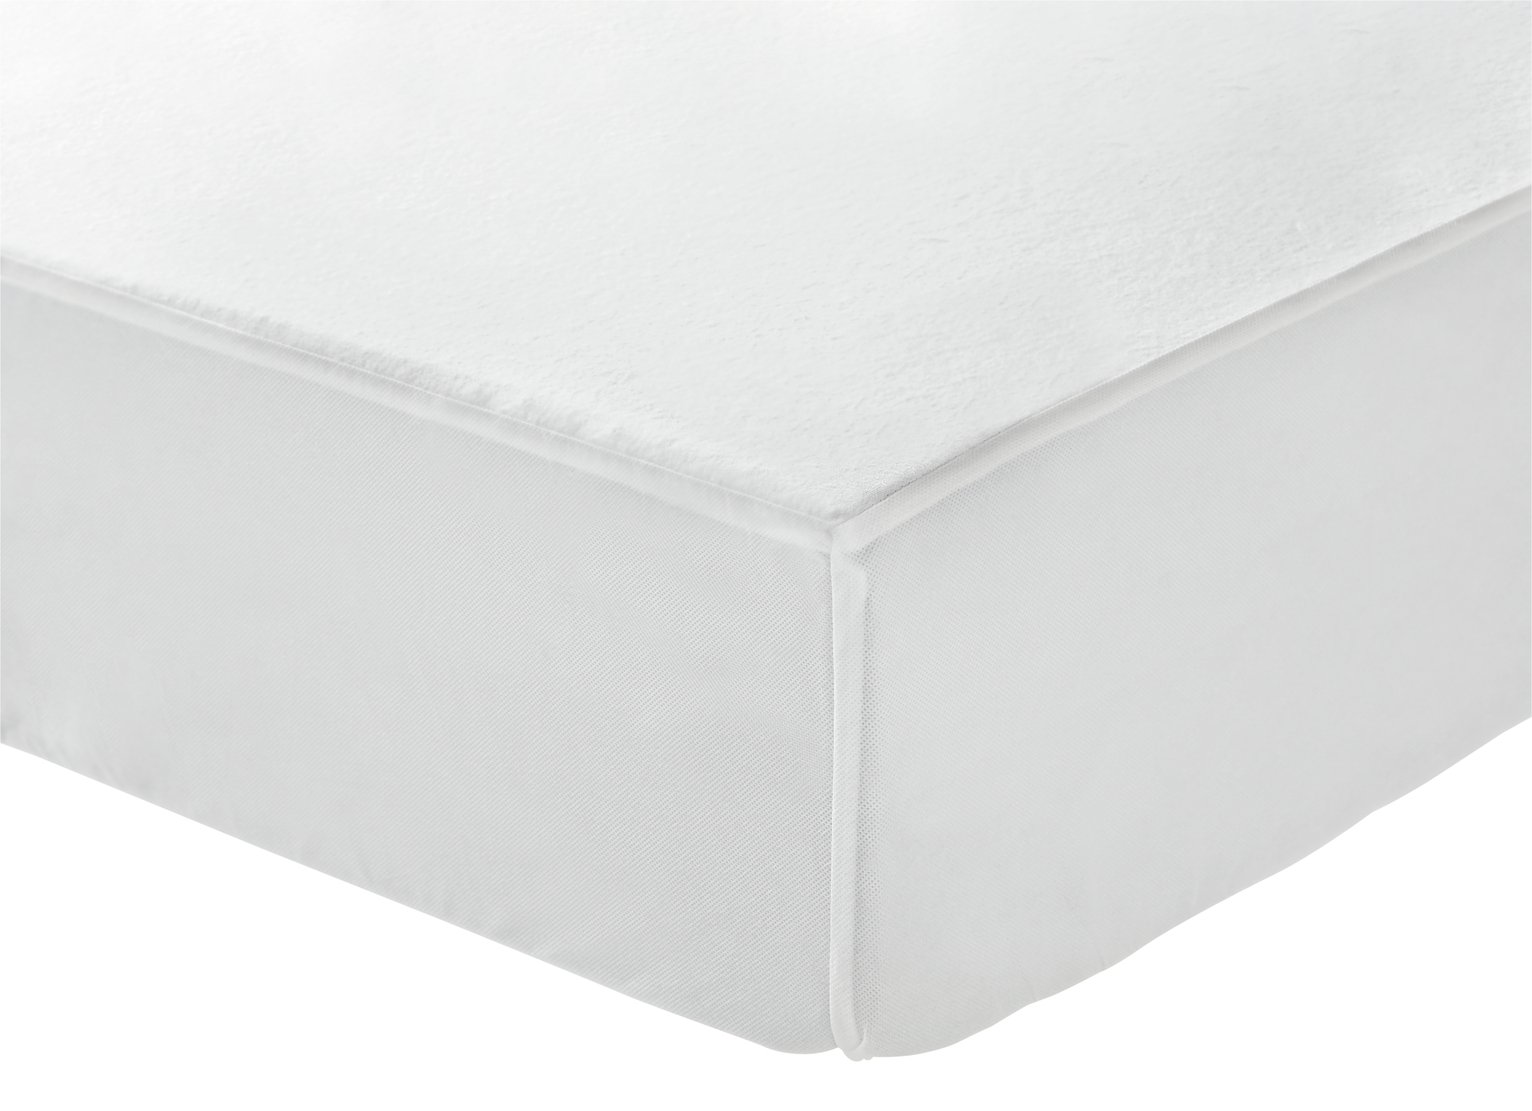 Argos Home Soft Cotton Waterproof Mattress Protector